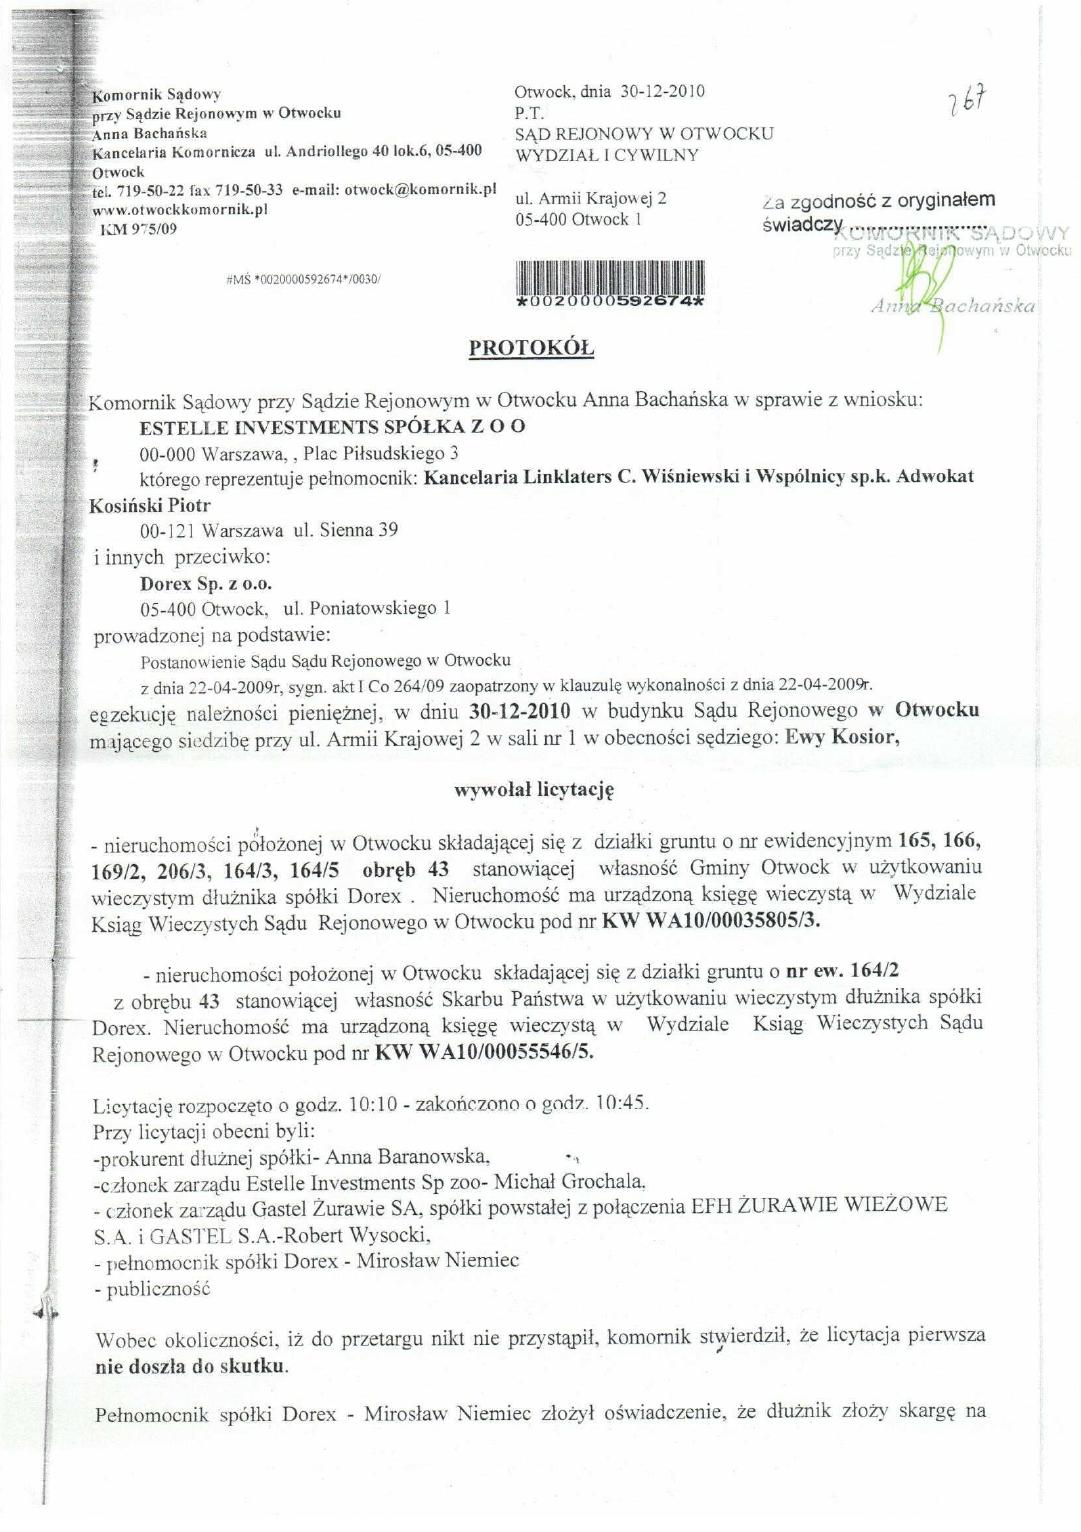 cs go status swatania ihres konta wird ermittelt